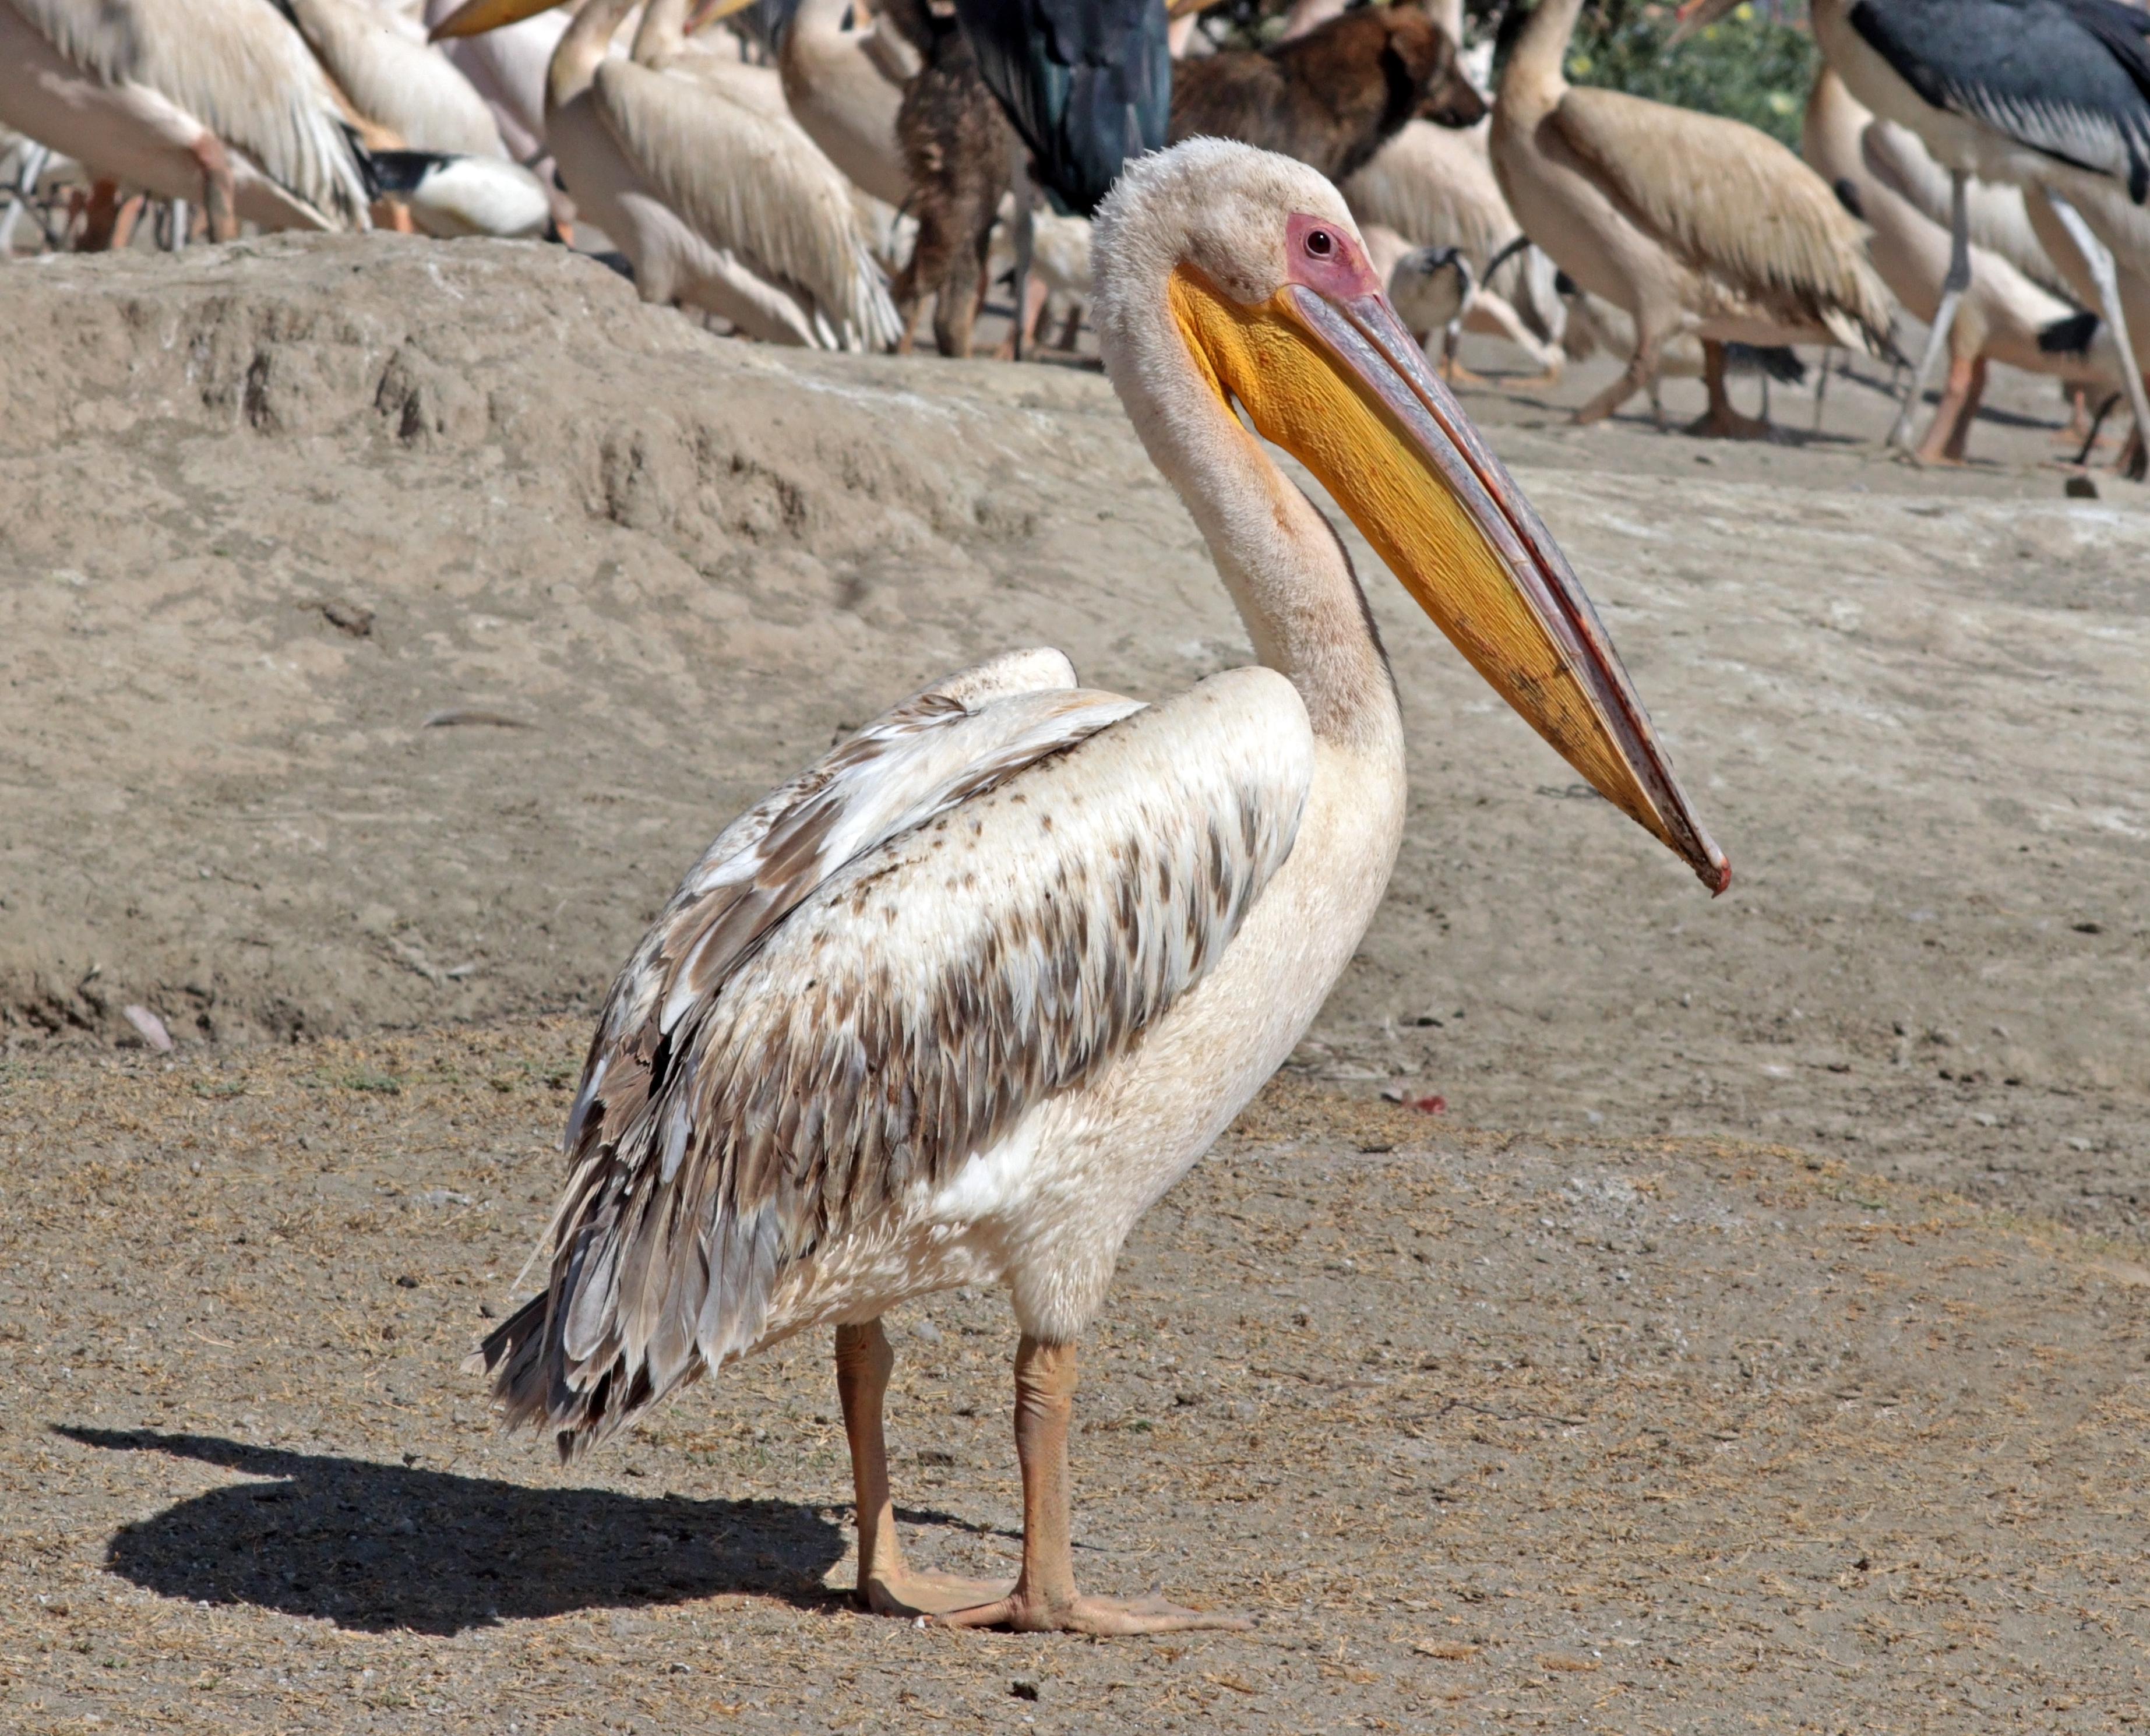 Great white pelican (Pelecanus onocrotalus), Lake Ziway, Ethiopia. Photo taken on December 21, 2017.